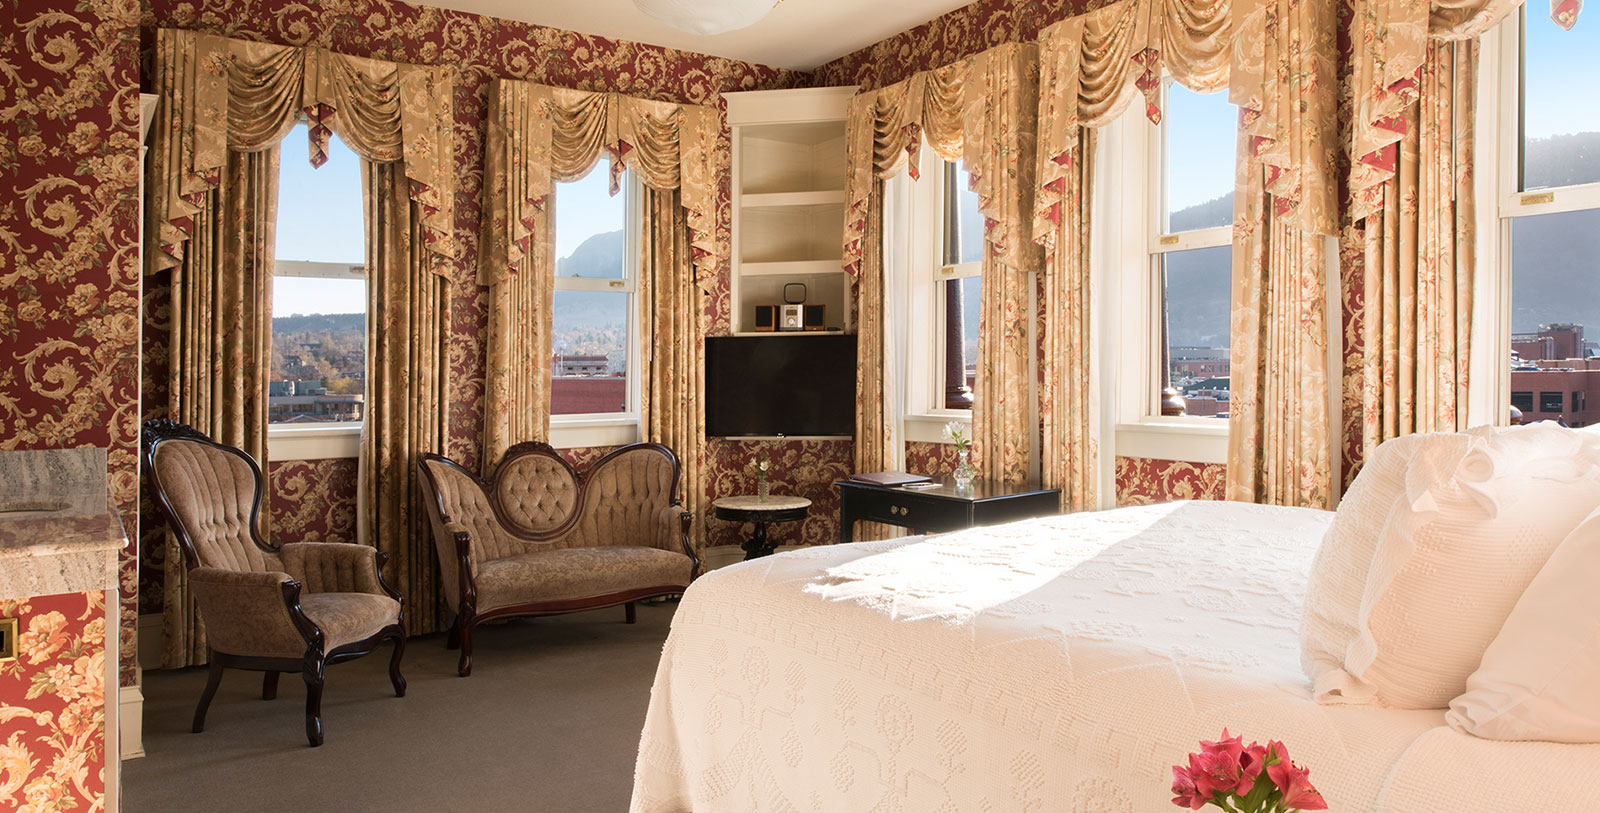 Image of Historic King Guestroom Interior, Hotel Boulderado in Boulder, Colorado, 1909, Member of Historic Hotels of America, Accommodations